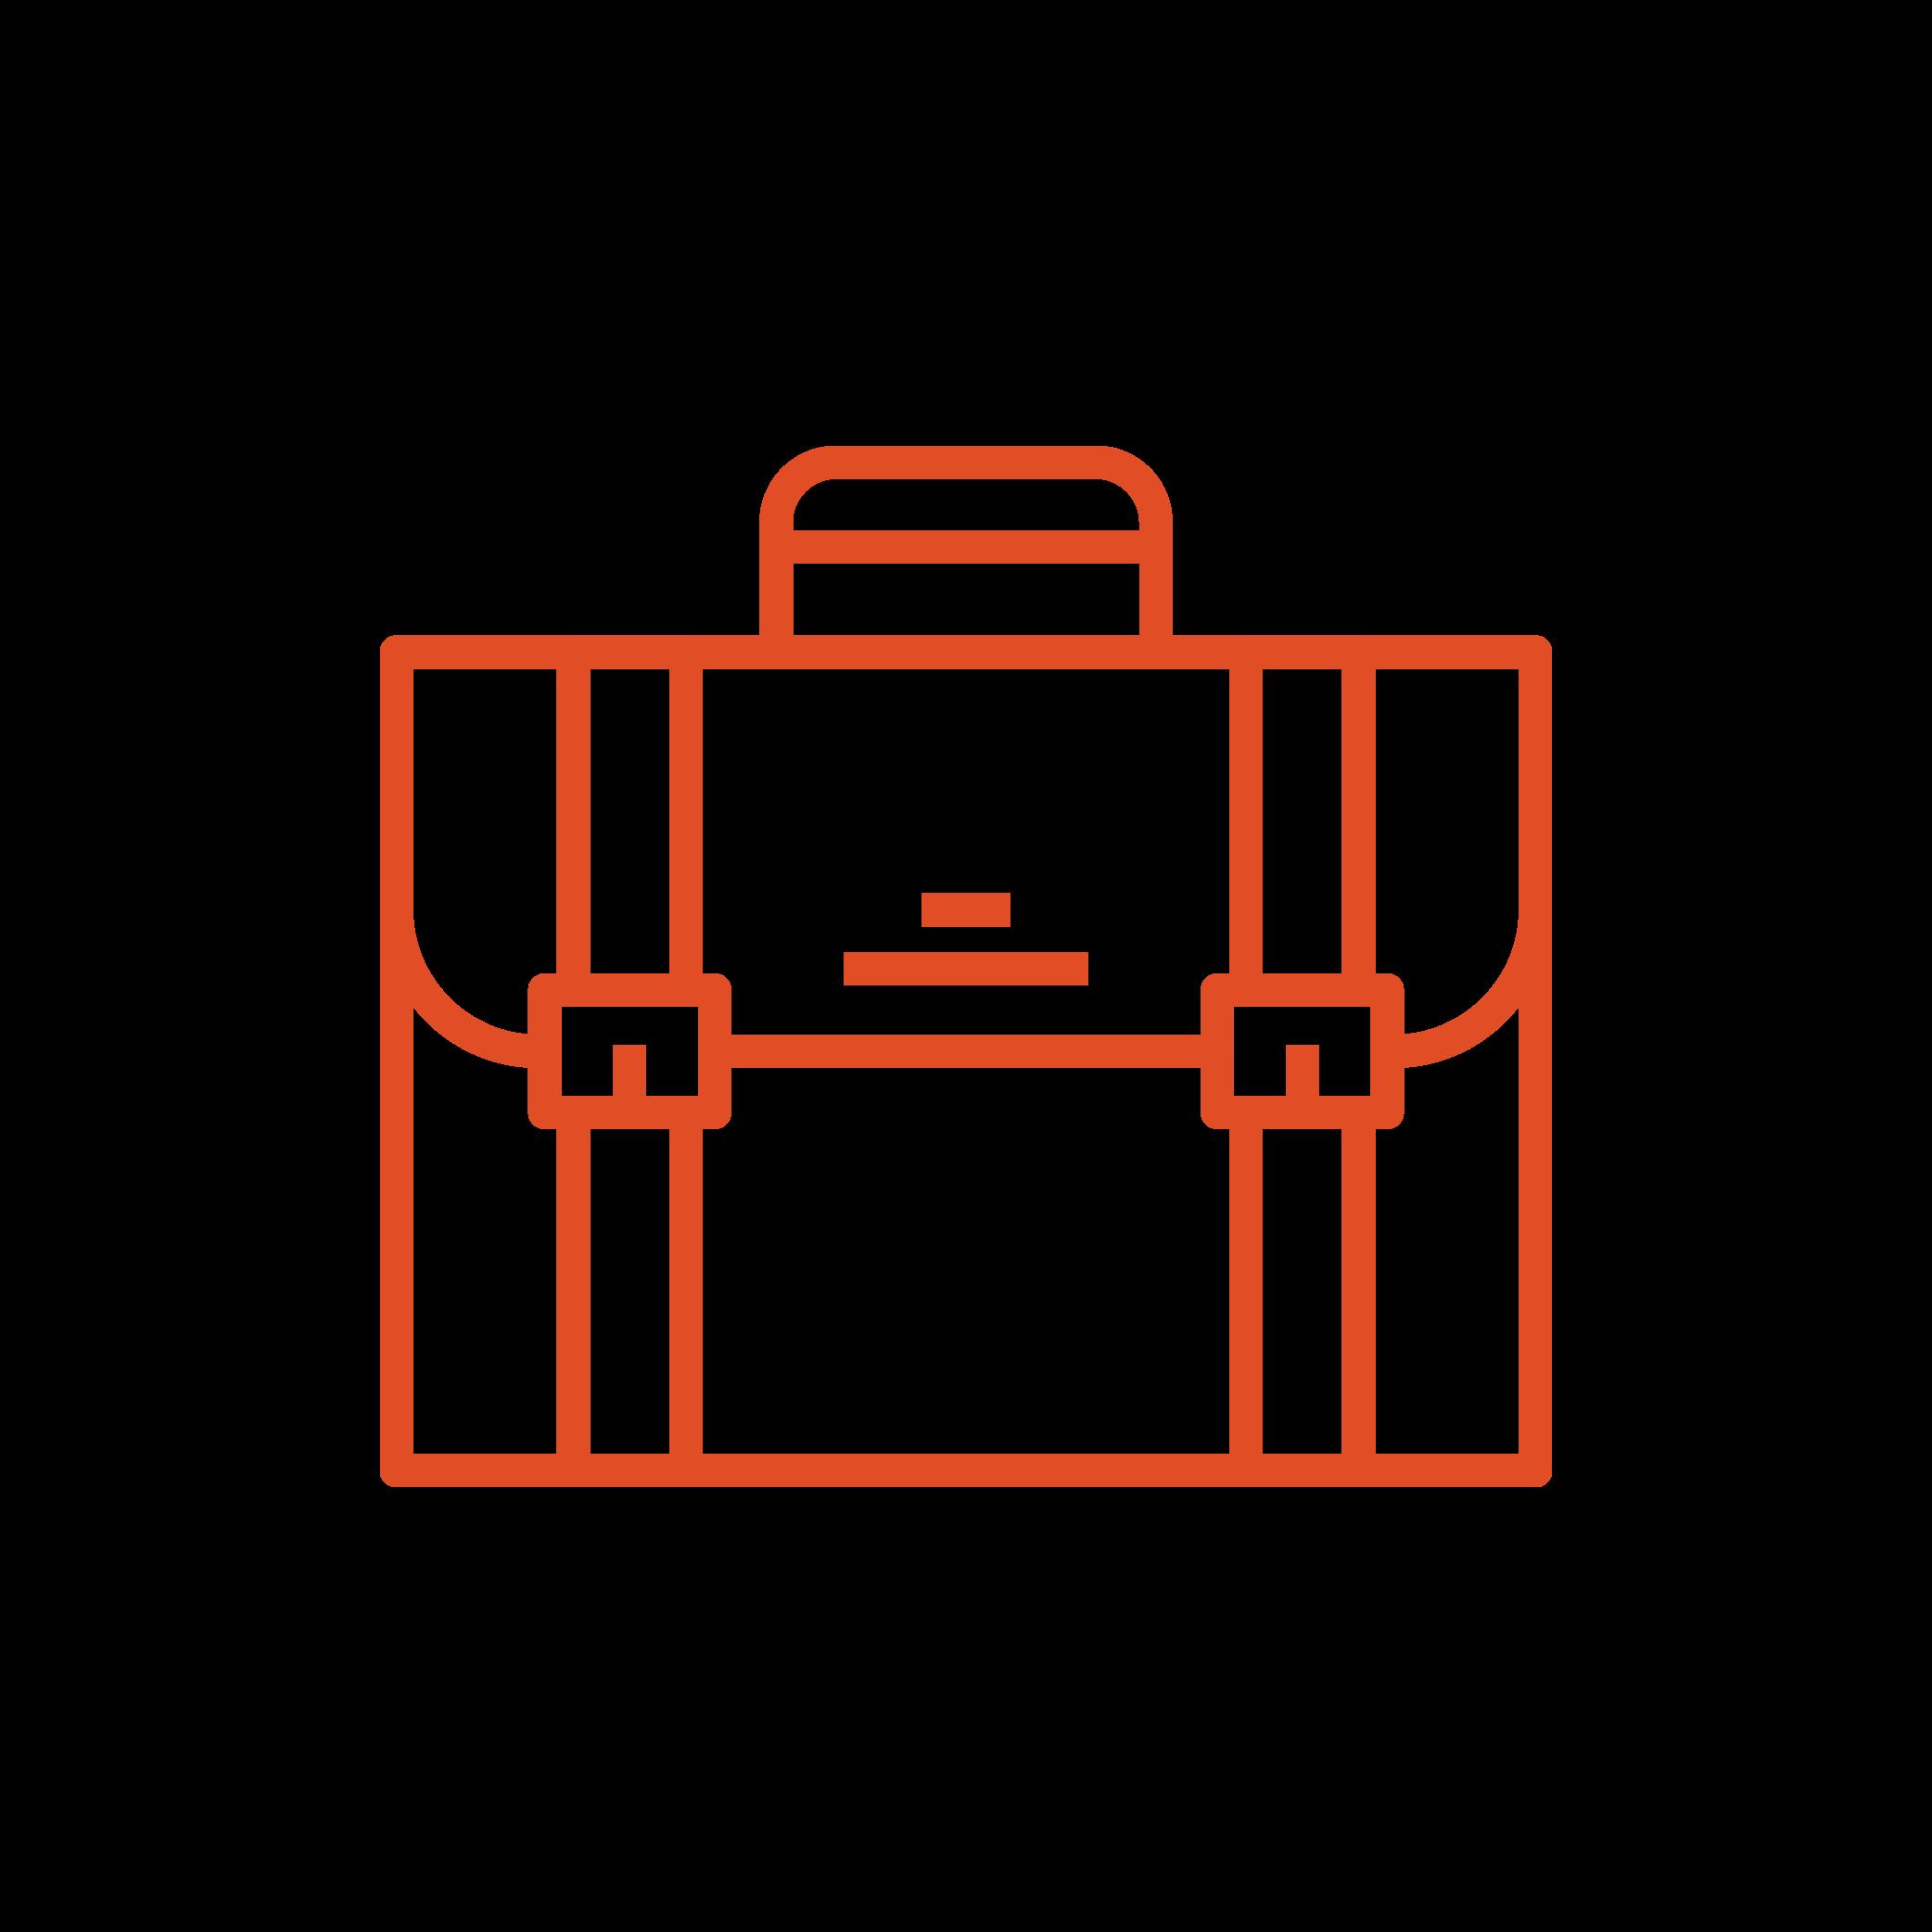 Neon-Line_Luggage